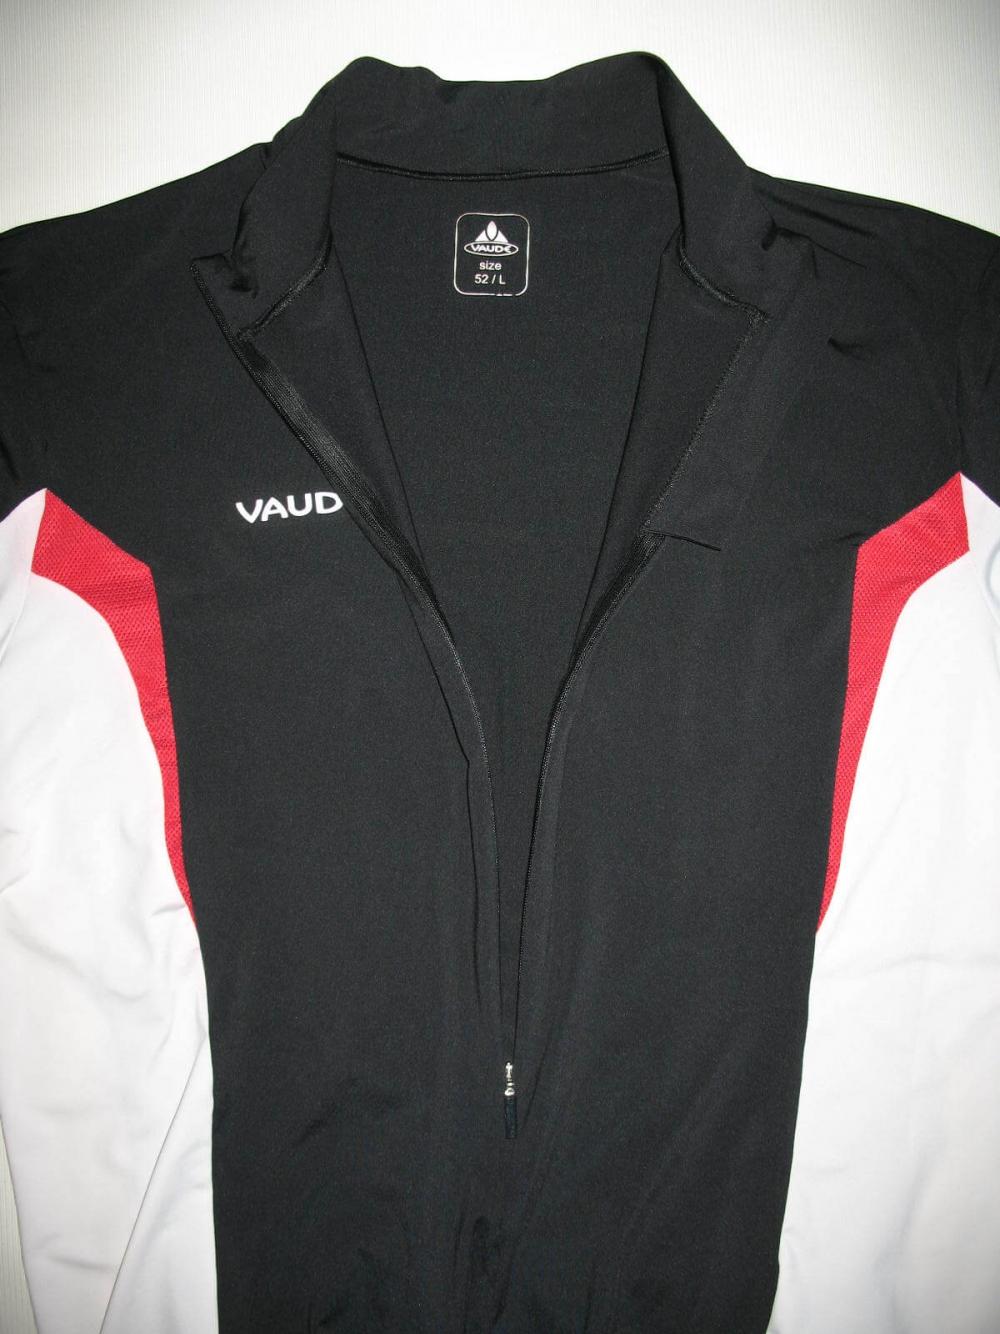 Веломайка  VAUDE cycling jersey (размер 52/L) - 2